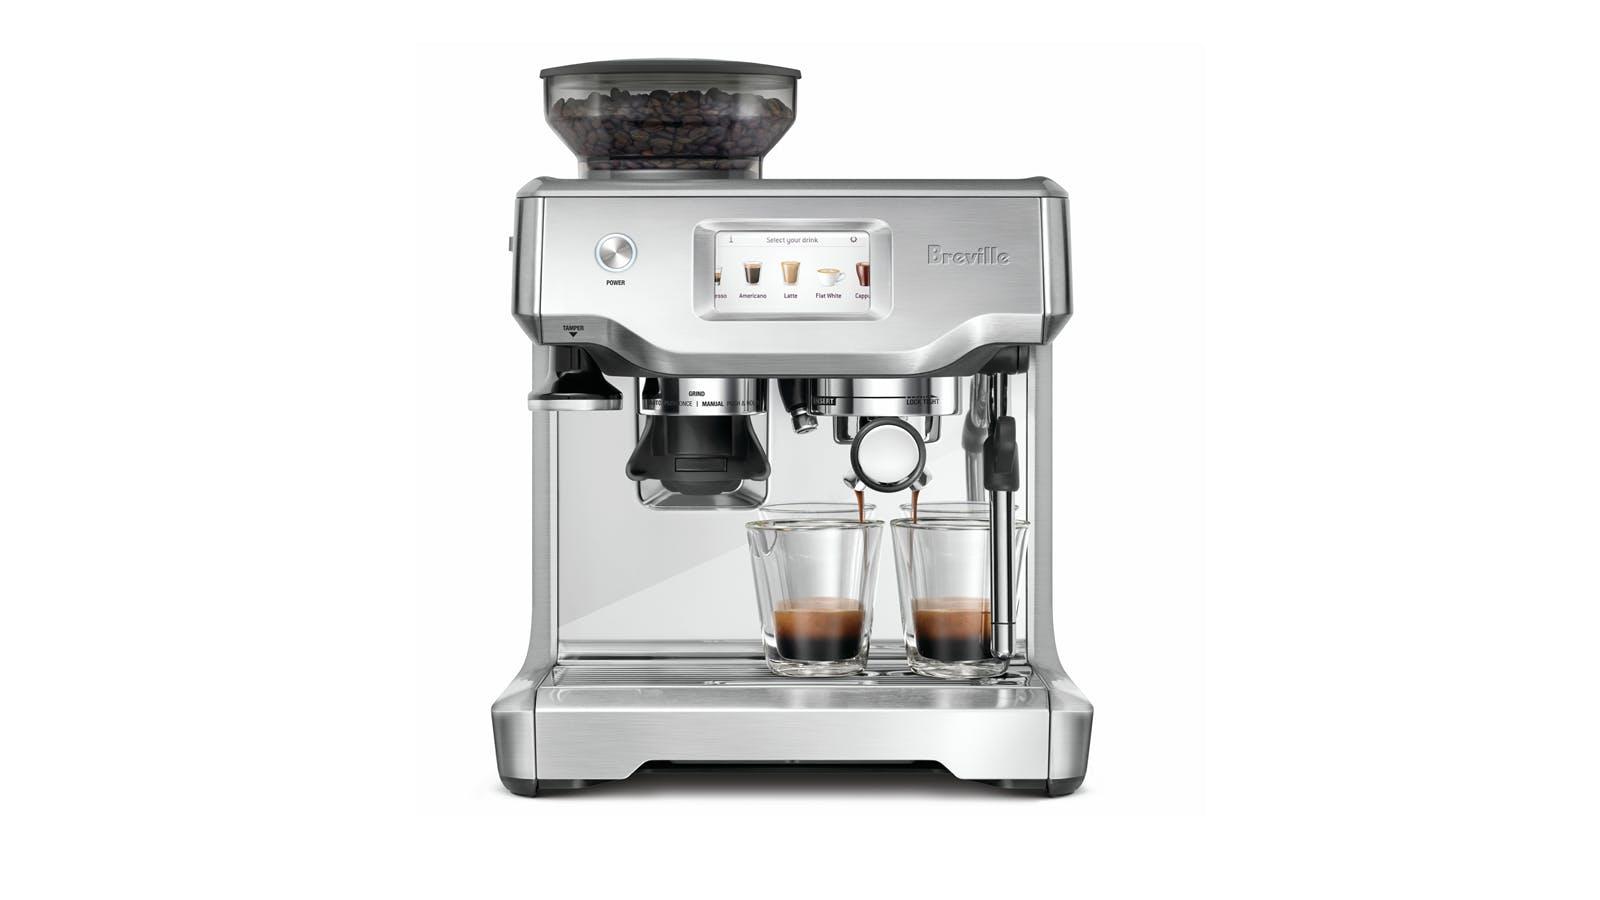 Breville Bes 880 The Barista Coffee Machine Harvey